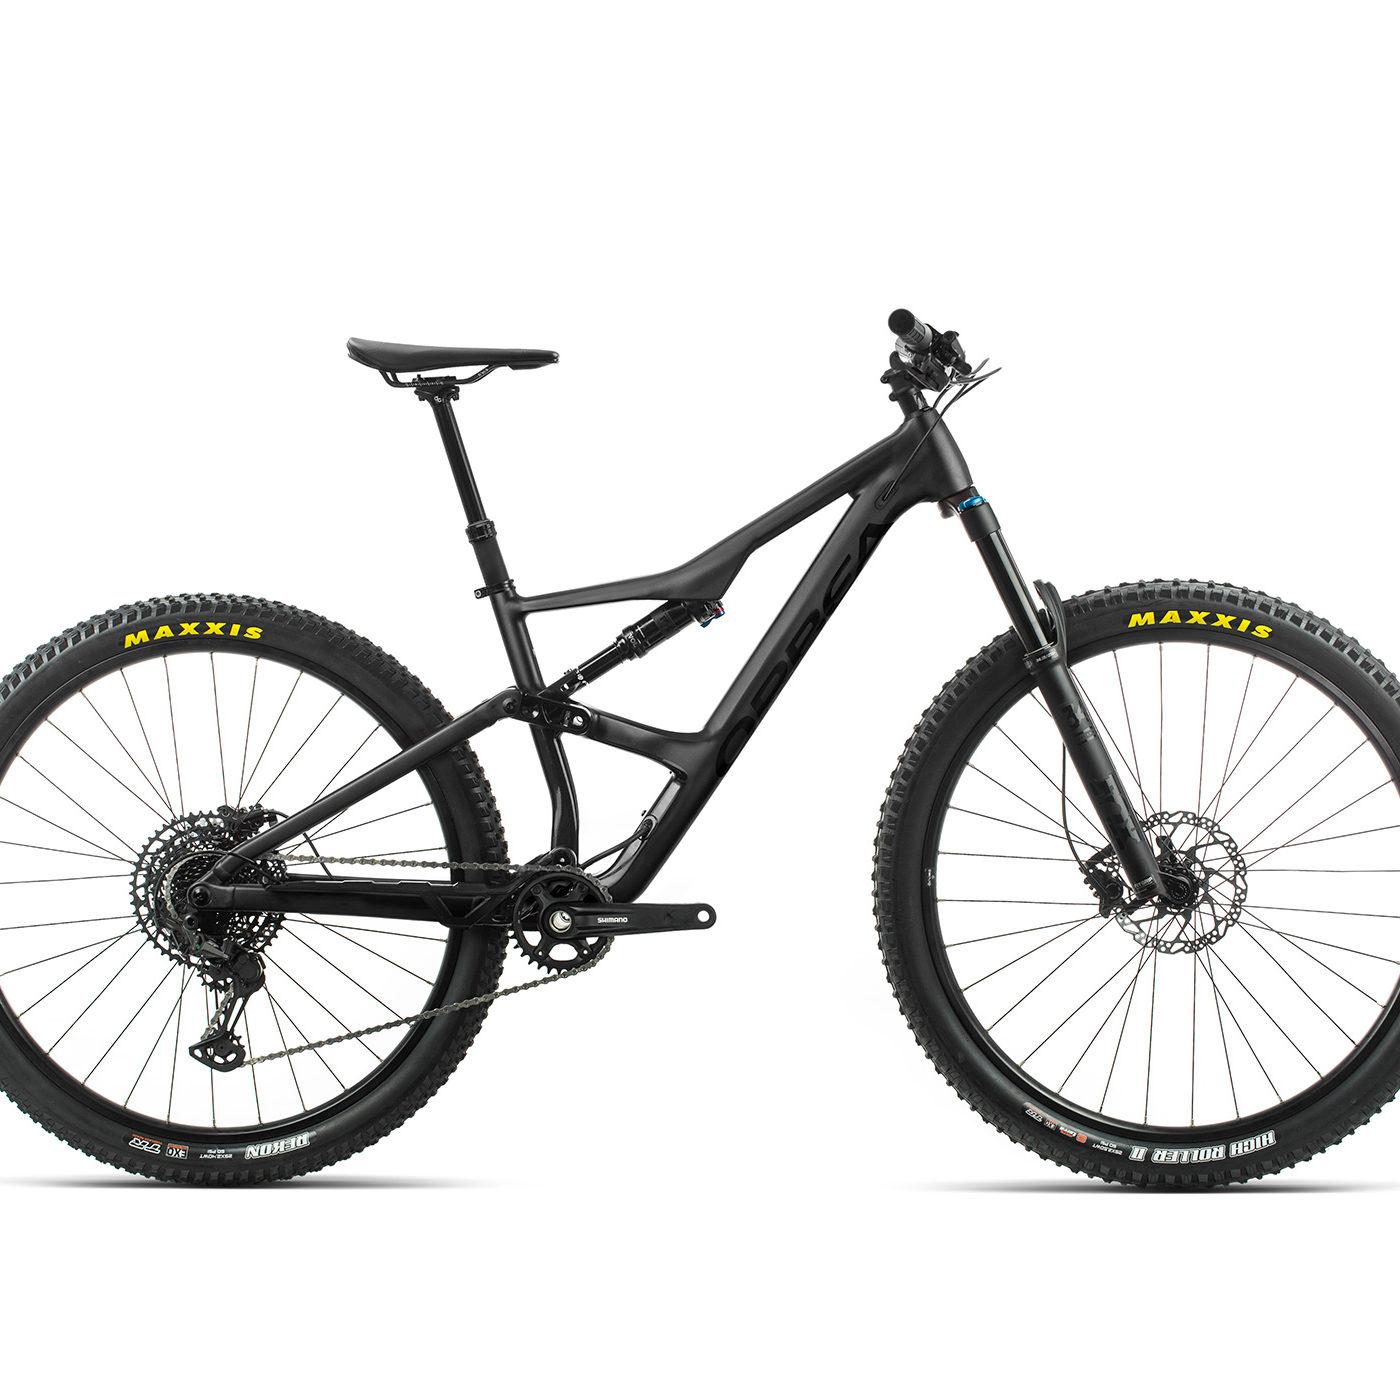 ORBEA Occam H20 - METALLIC ZWART (DOF-GLOSS) @G-Bikes